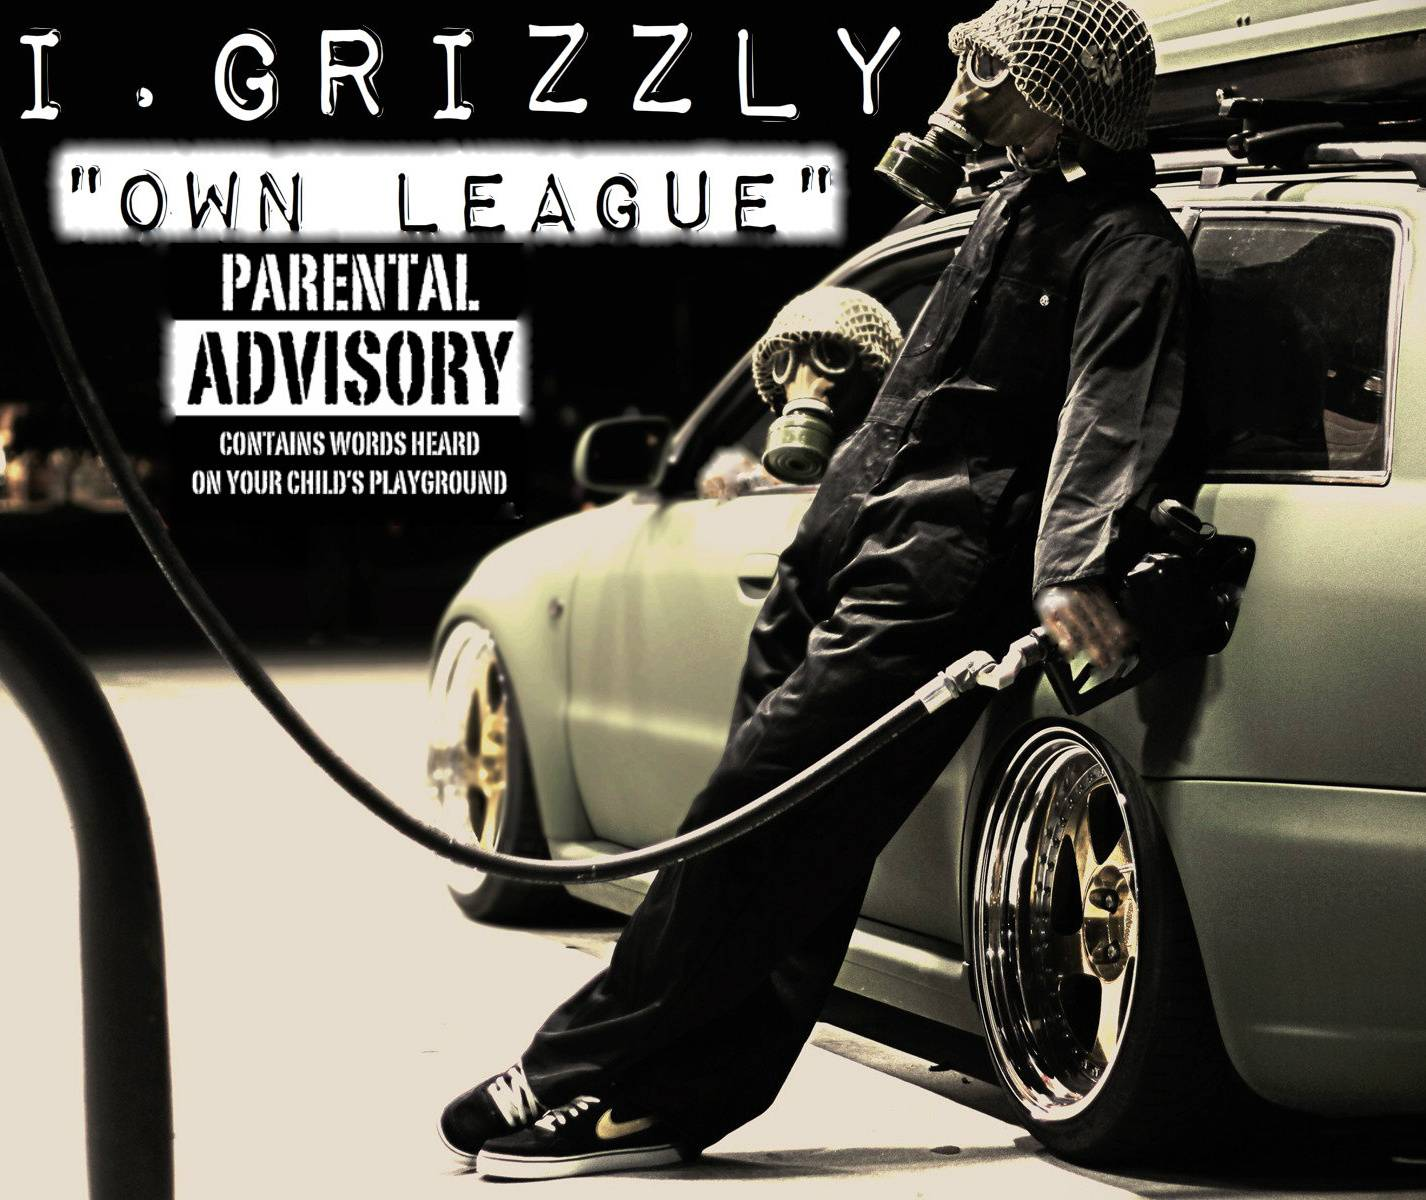 Own League Cd Single